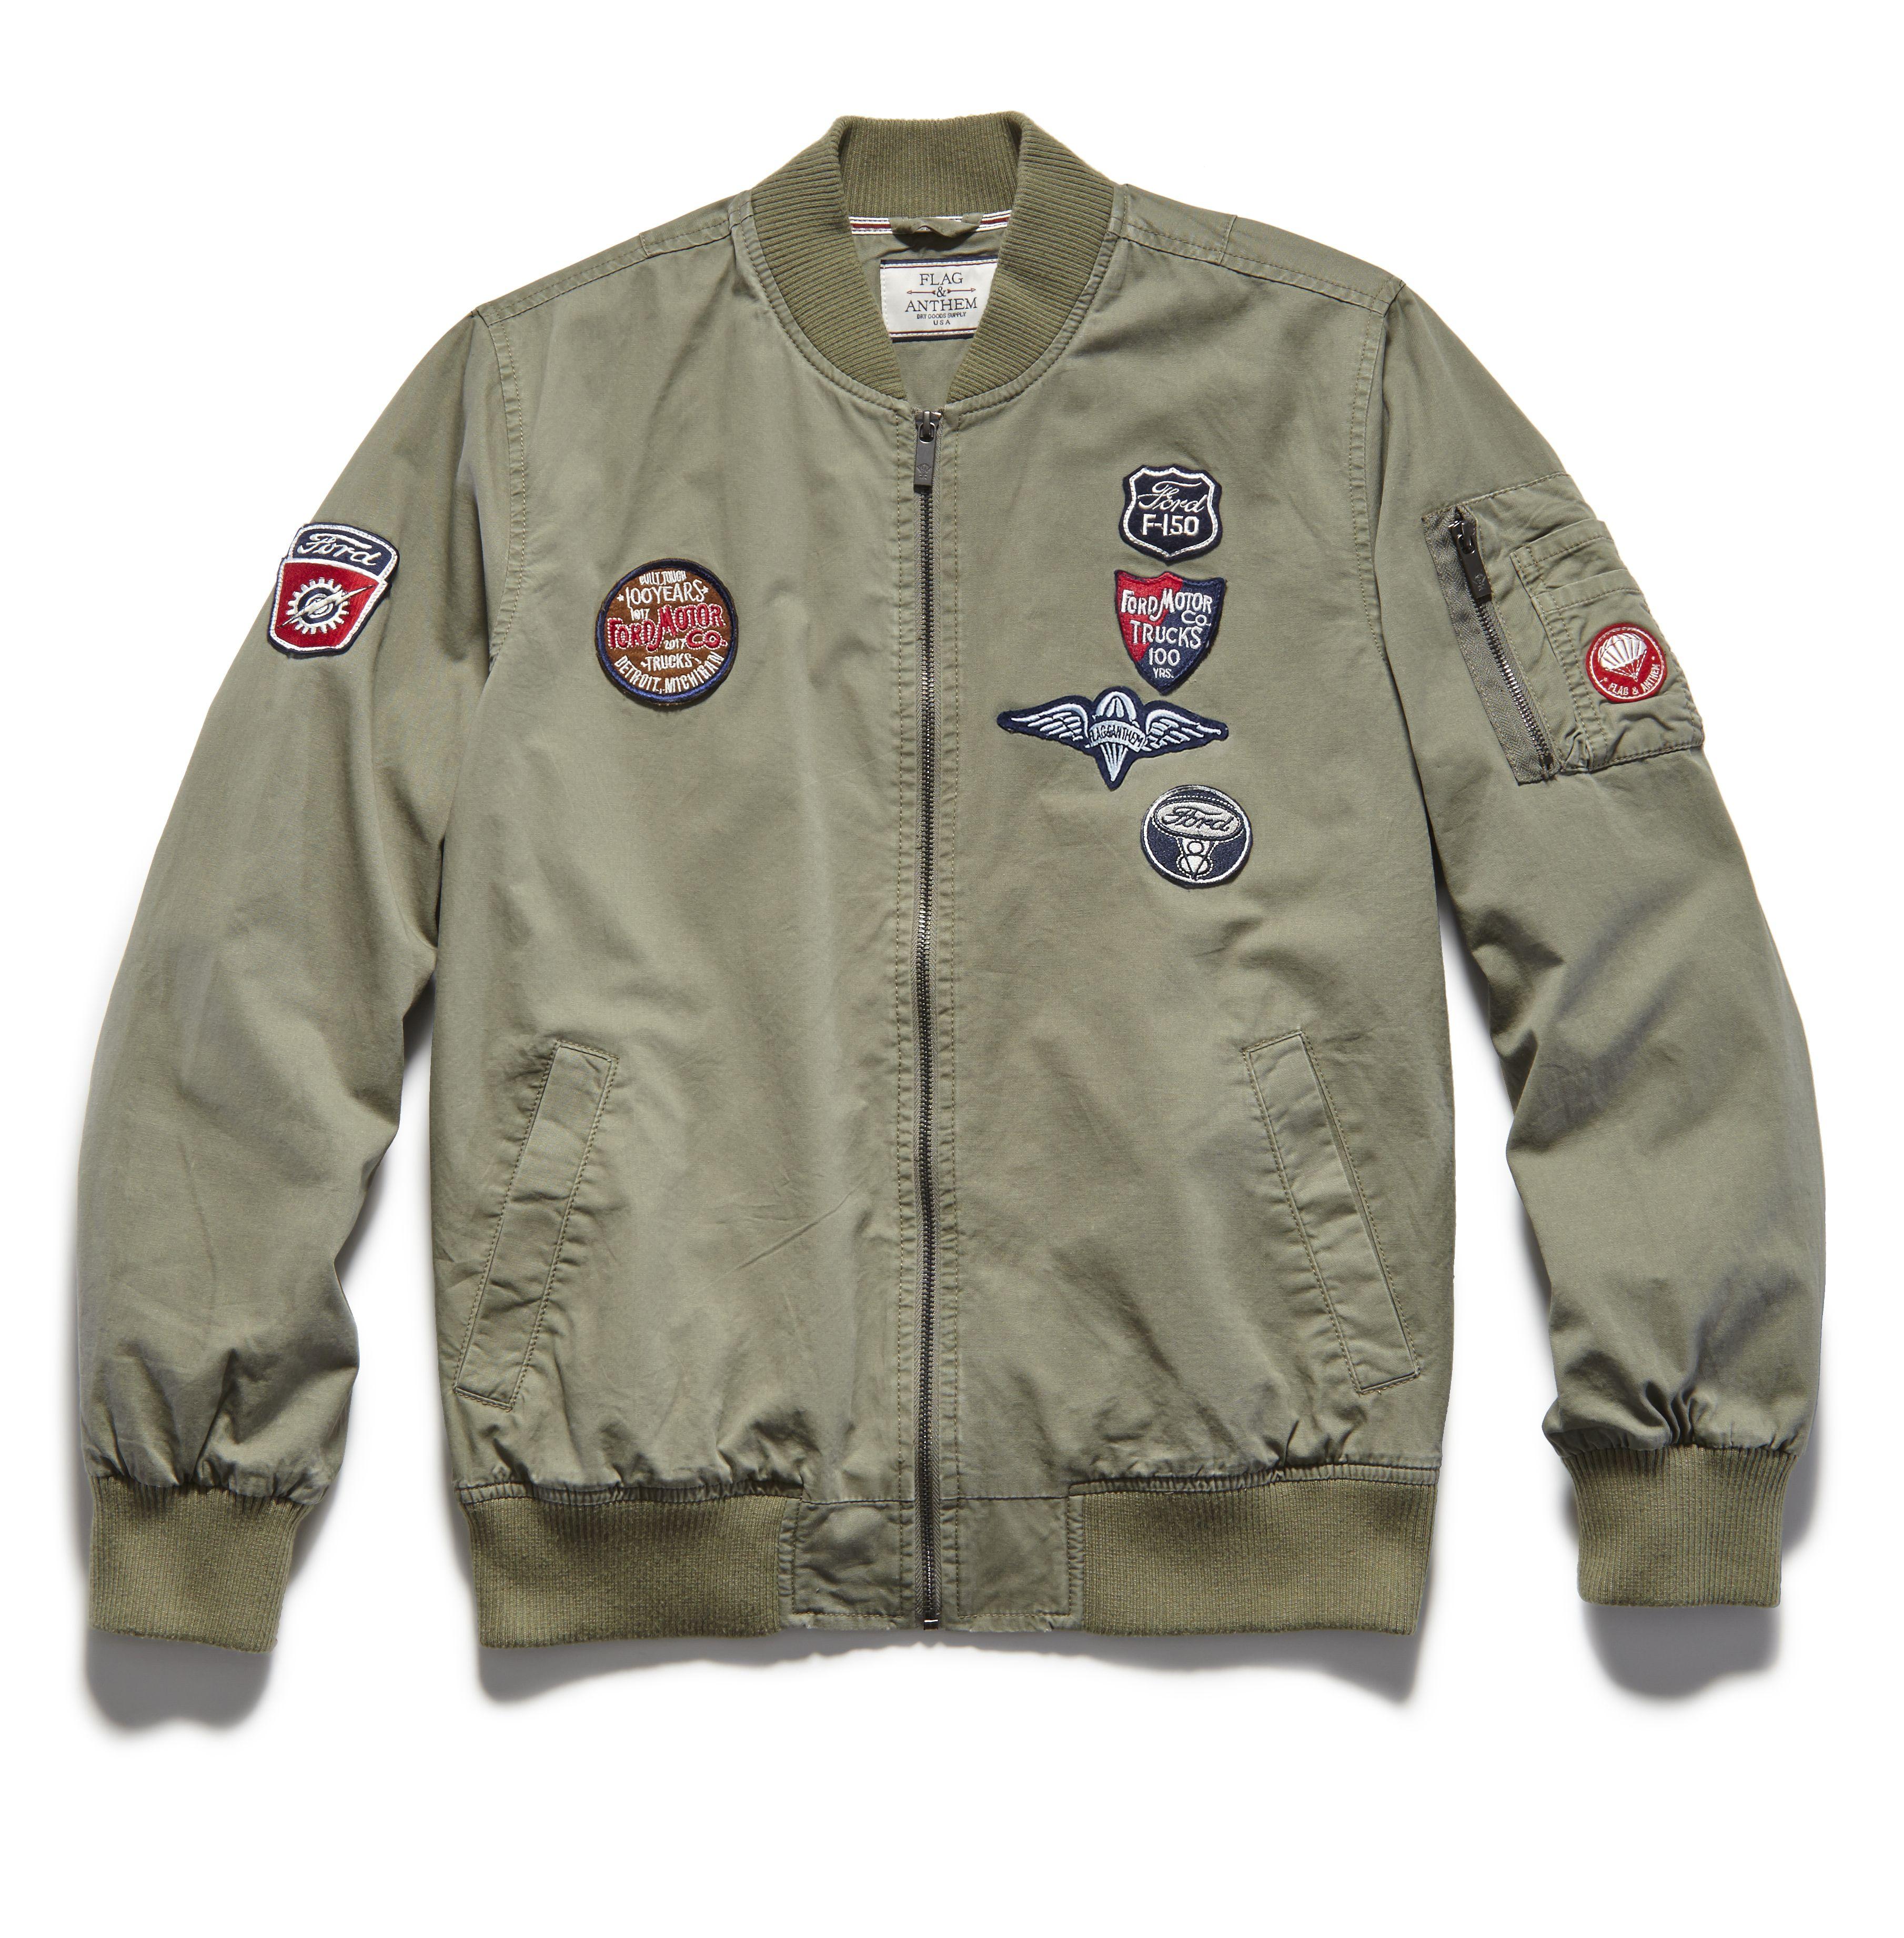 Ford Patch Bomber Jacket Flagandanthem Ford Jacket Menswear Bomber Jacket Patches Bomber Jacket Jackets [ 3684 x 3619 Pixel ]